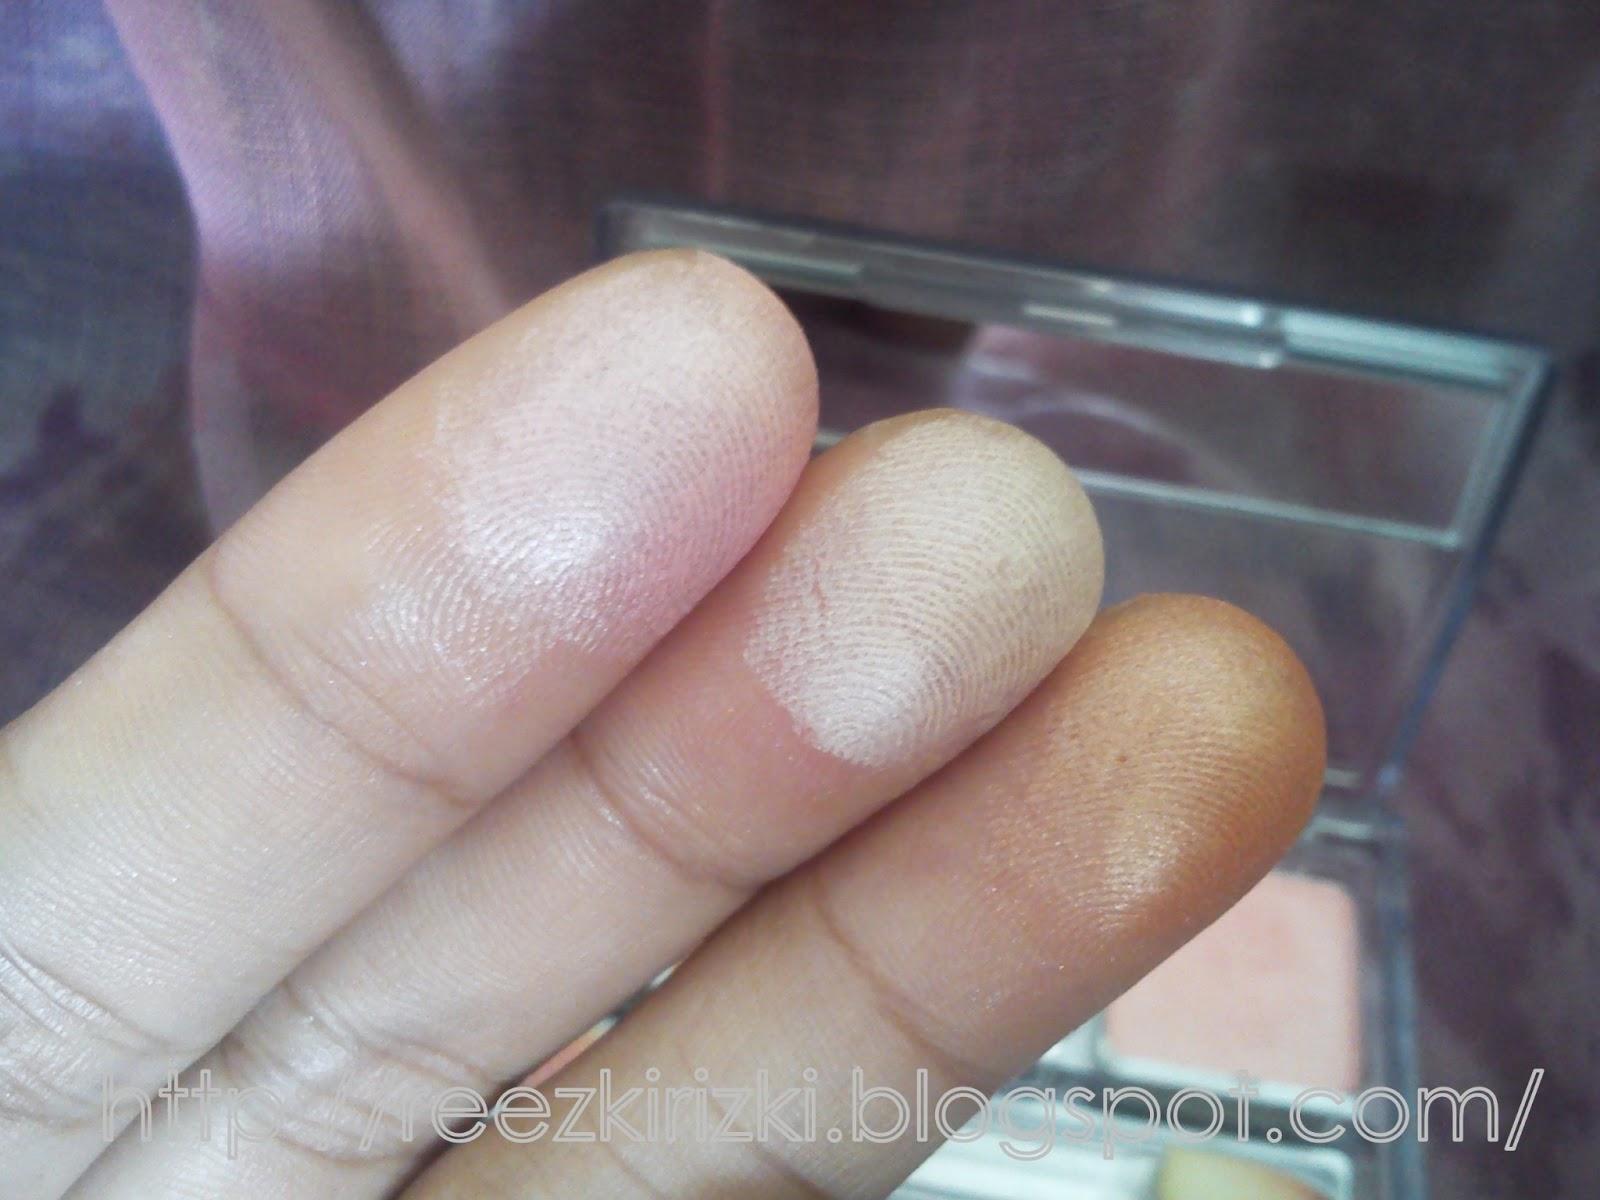 Reezkis Beauty Blog Review Wardah Double Function Kit